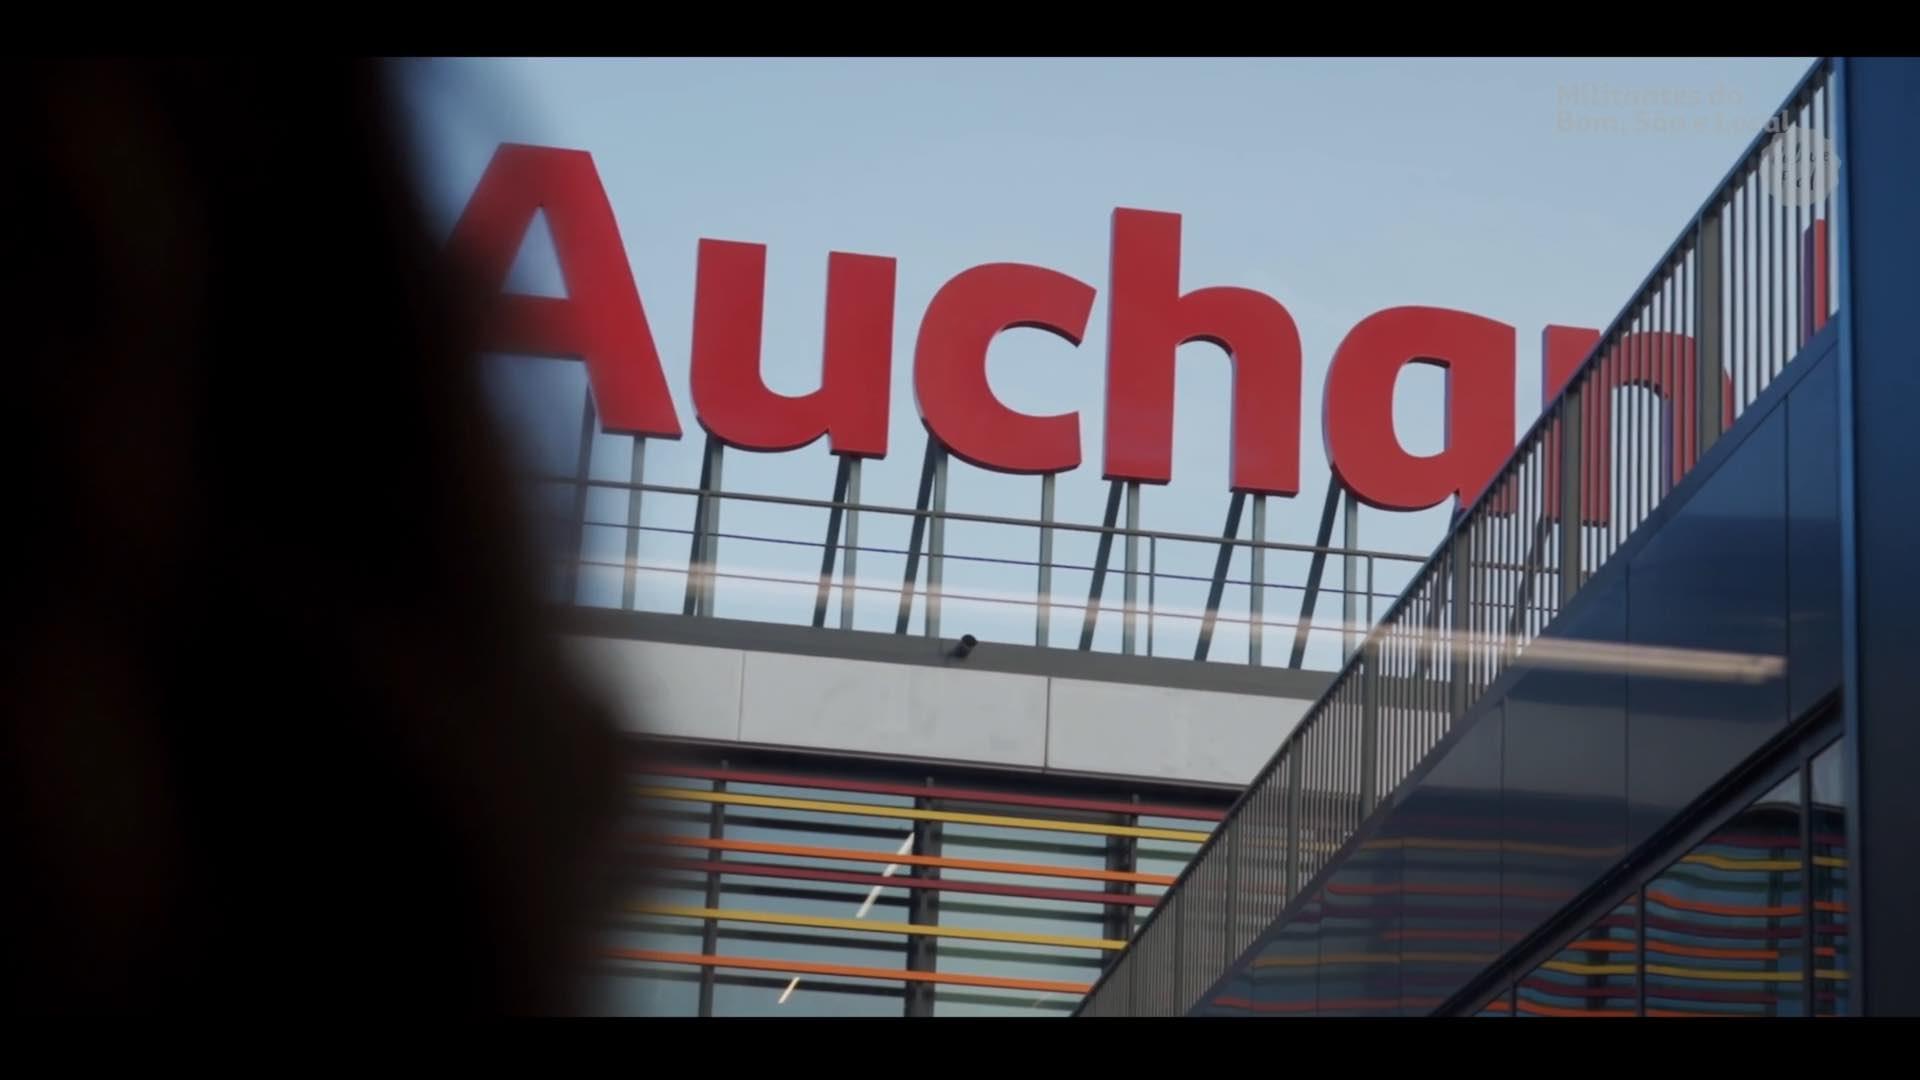 Auchan – Culture Food